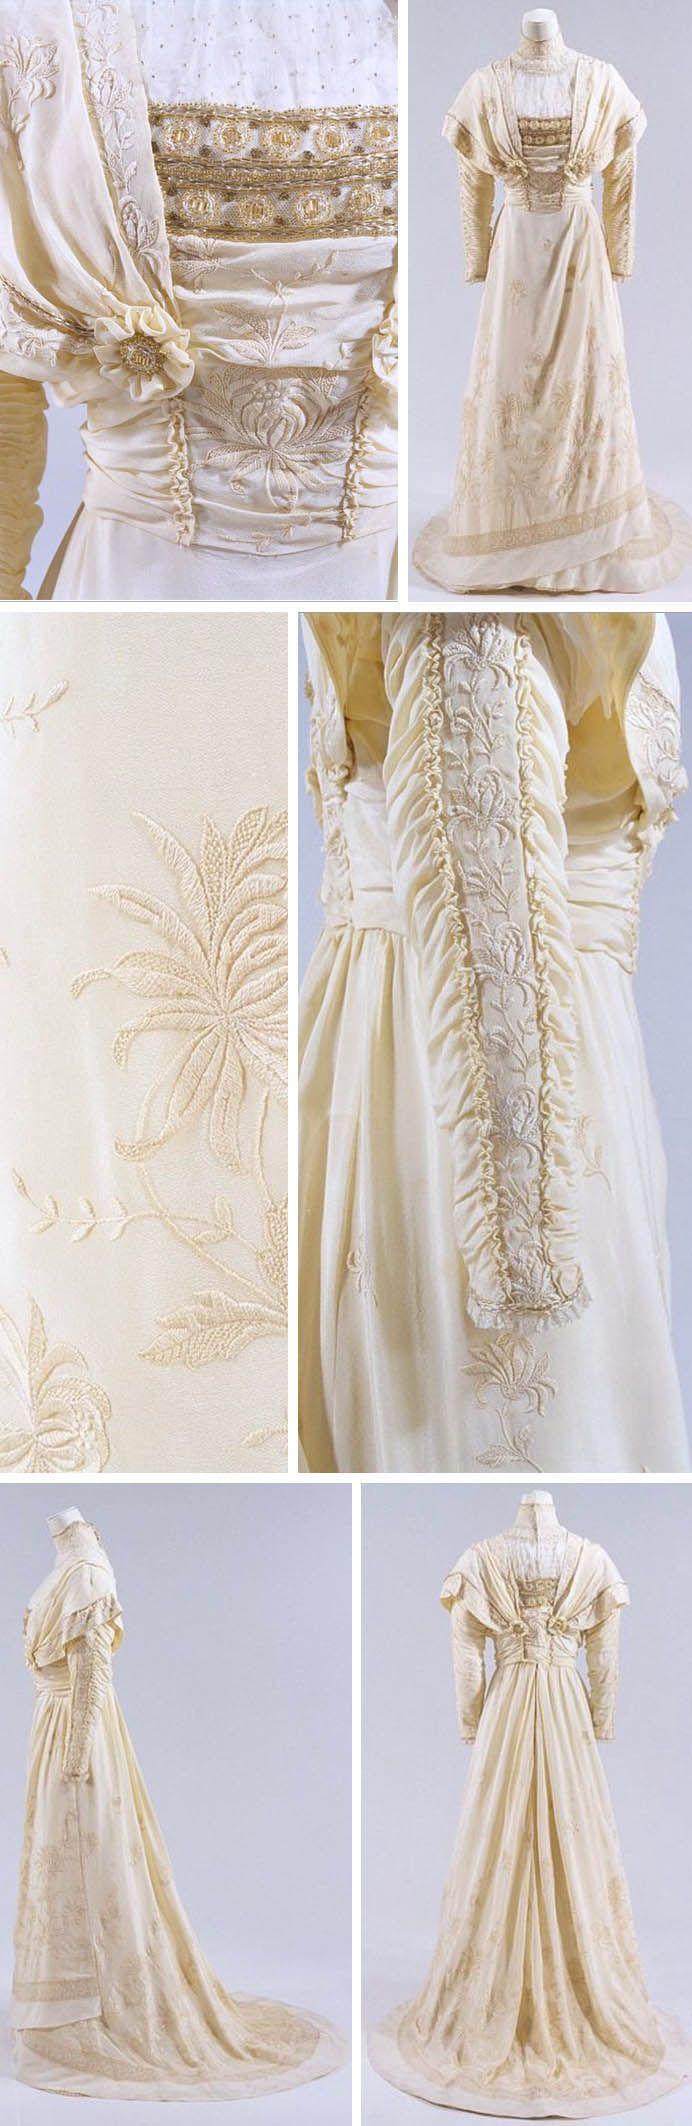 Cream silk dress, ca. 1910-12. Silk, lace, beads. Richly embroidered with chrysanthemums. Slightly higher waist, pintucks, asymmetrical skirt. Bunka Gakuen Costume Museum